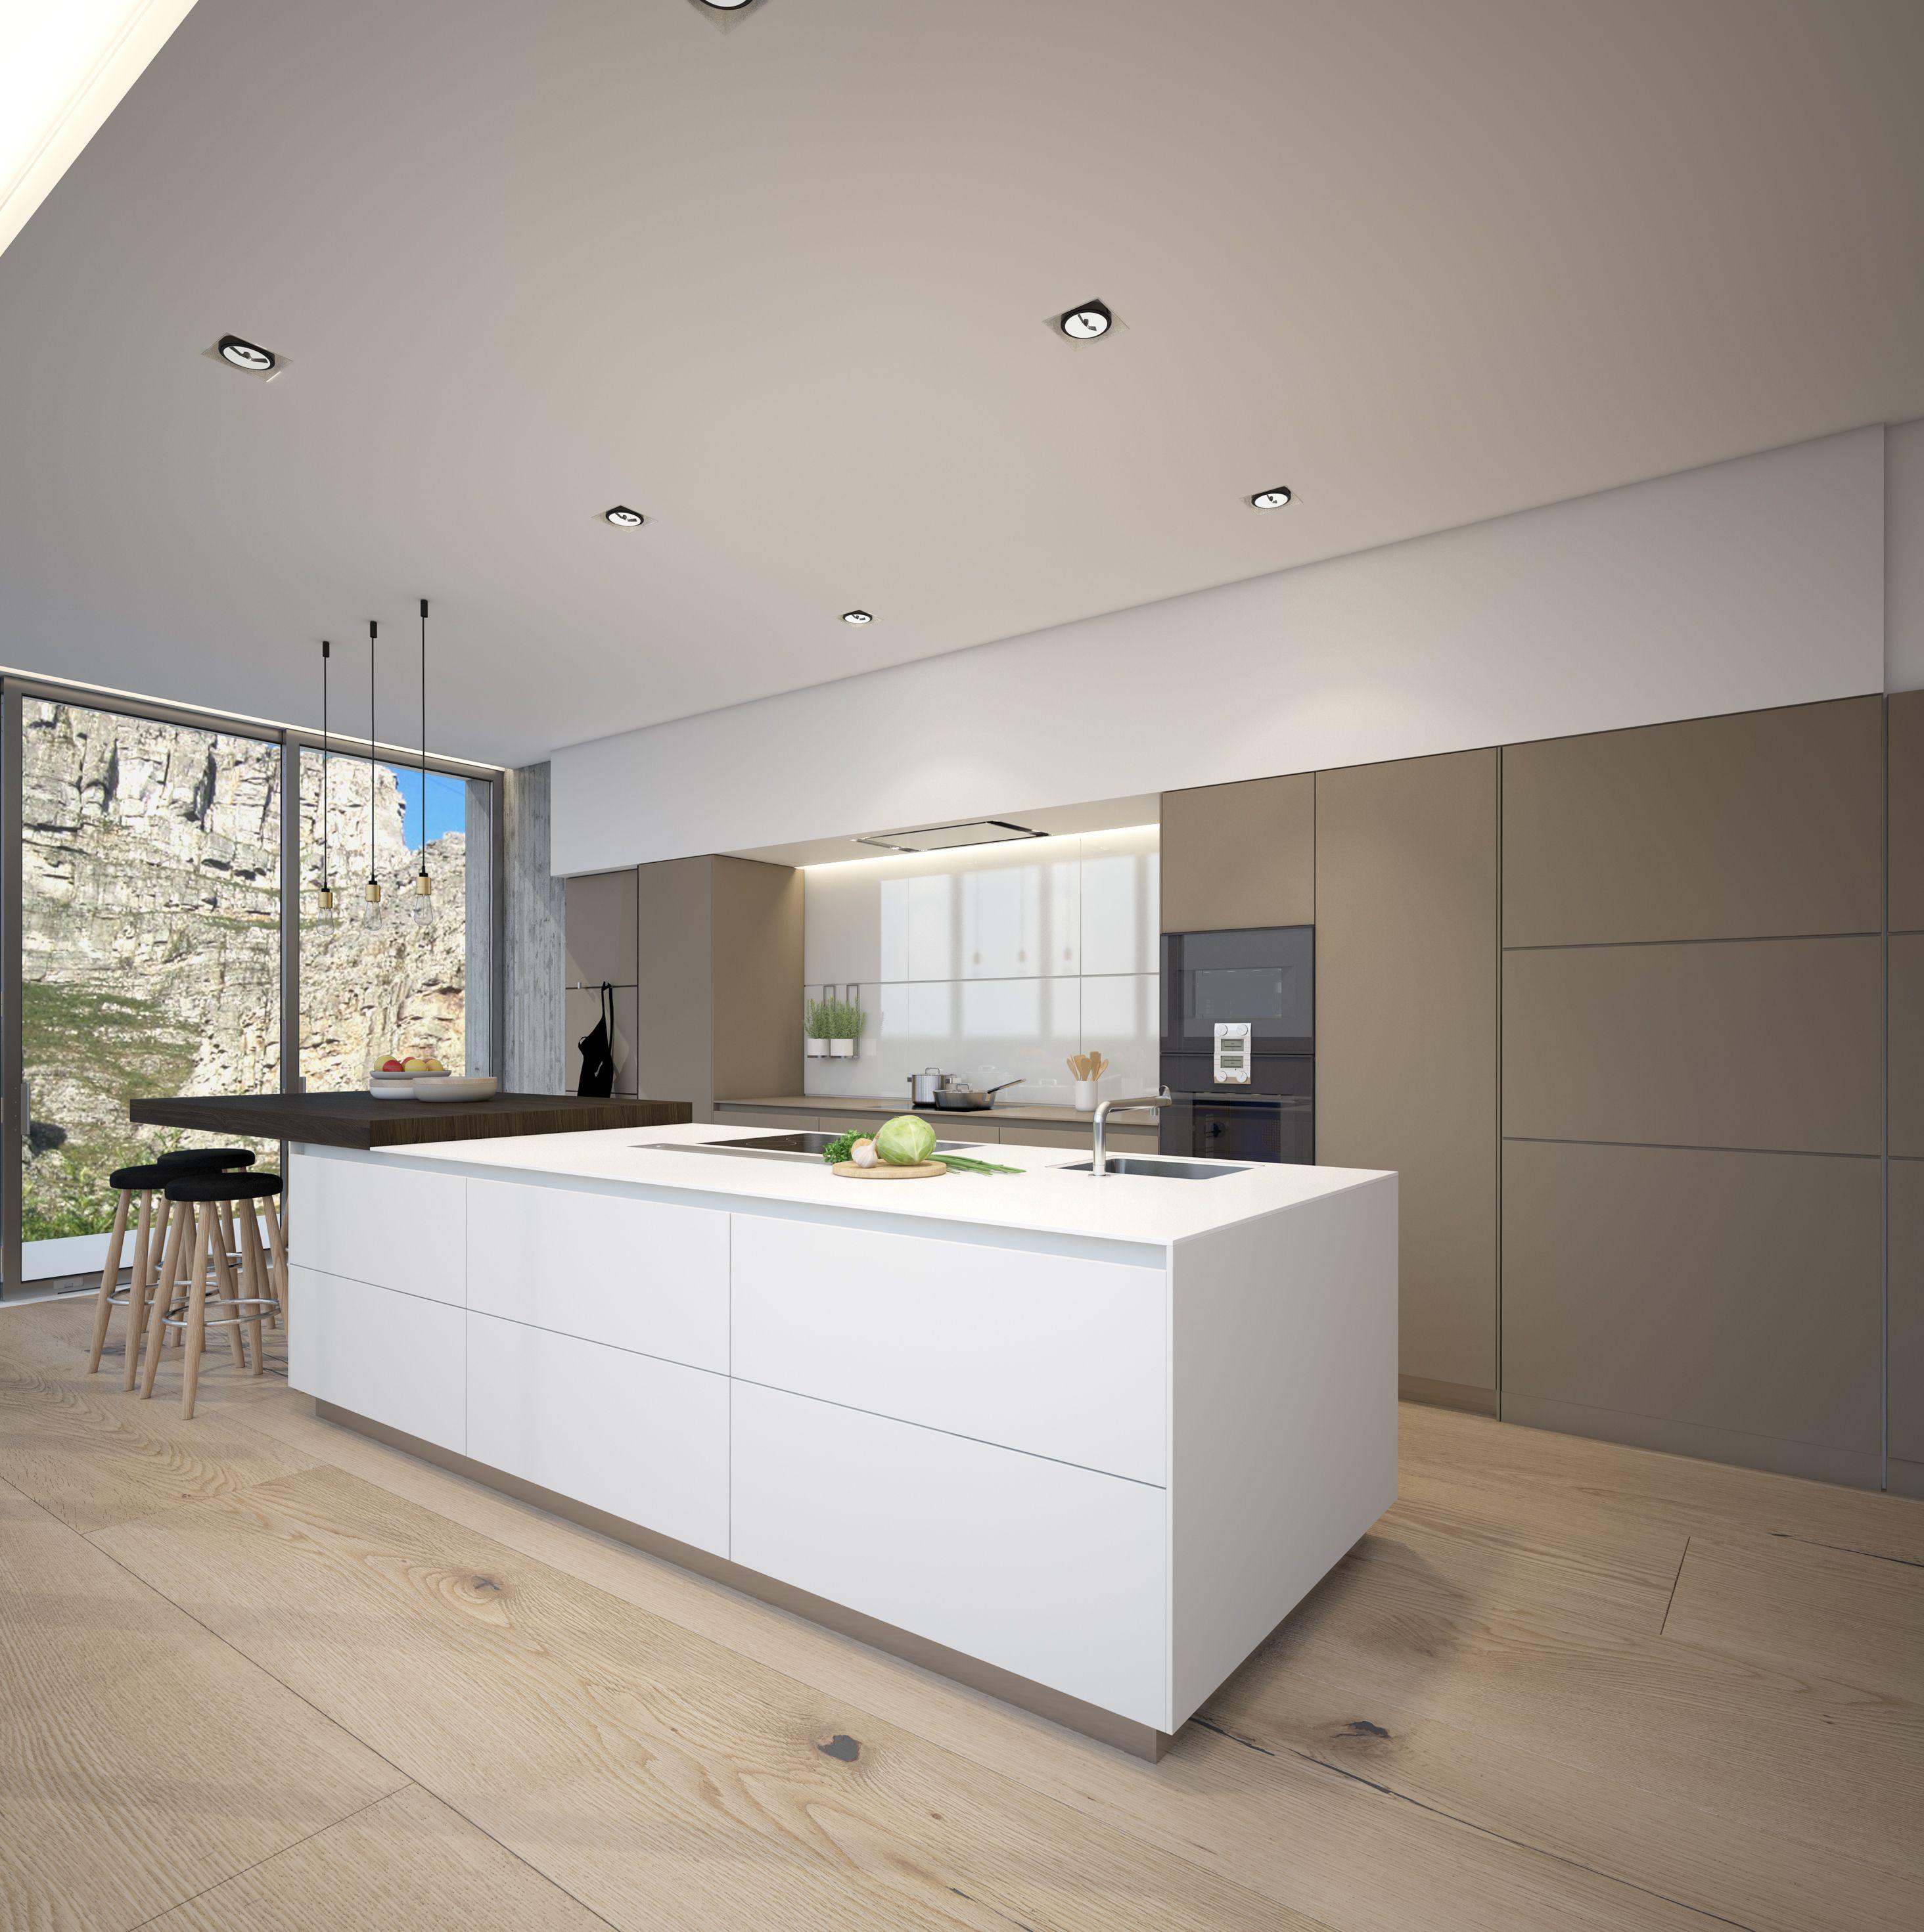 Designer Lisl Beresfors Bulthaup Cape Town Keuken Ontwerp Keuken Ontwerpen Modern Keukenontwerp